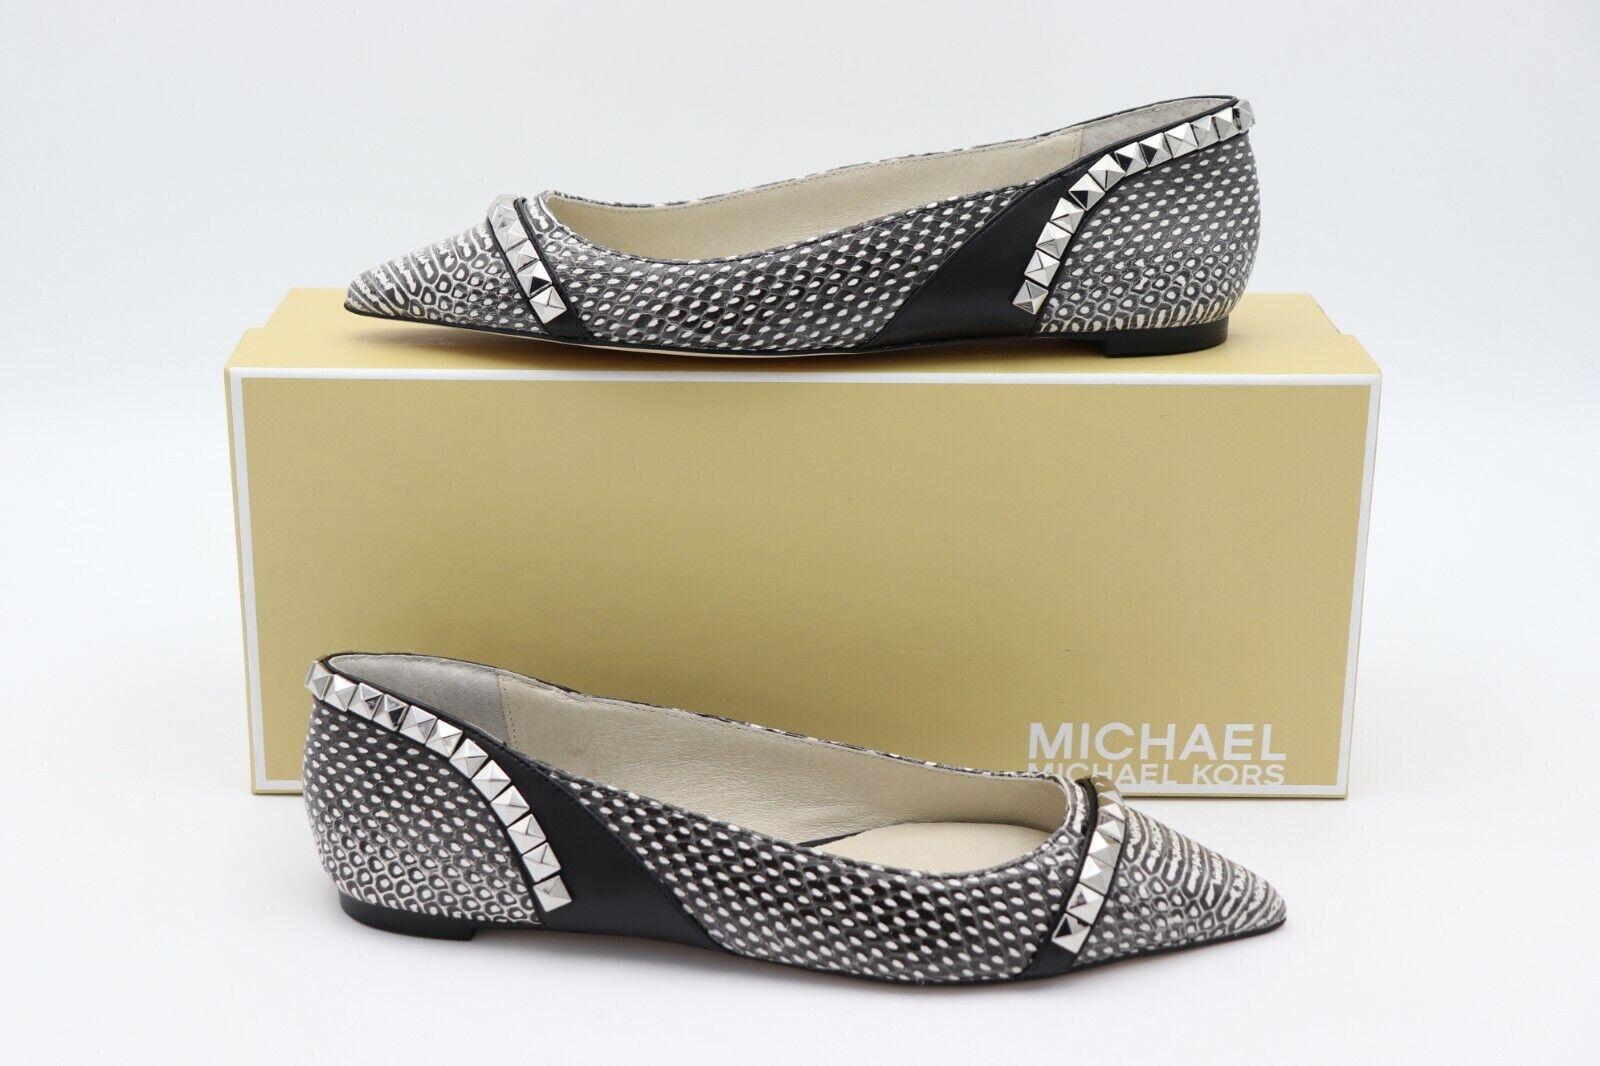 914e2fc6545d Michael Kors Ella Slip-ons Flats Size 7 Snake Skin for sale online ...